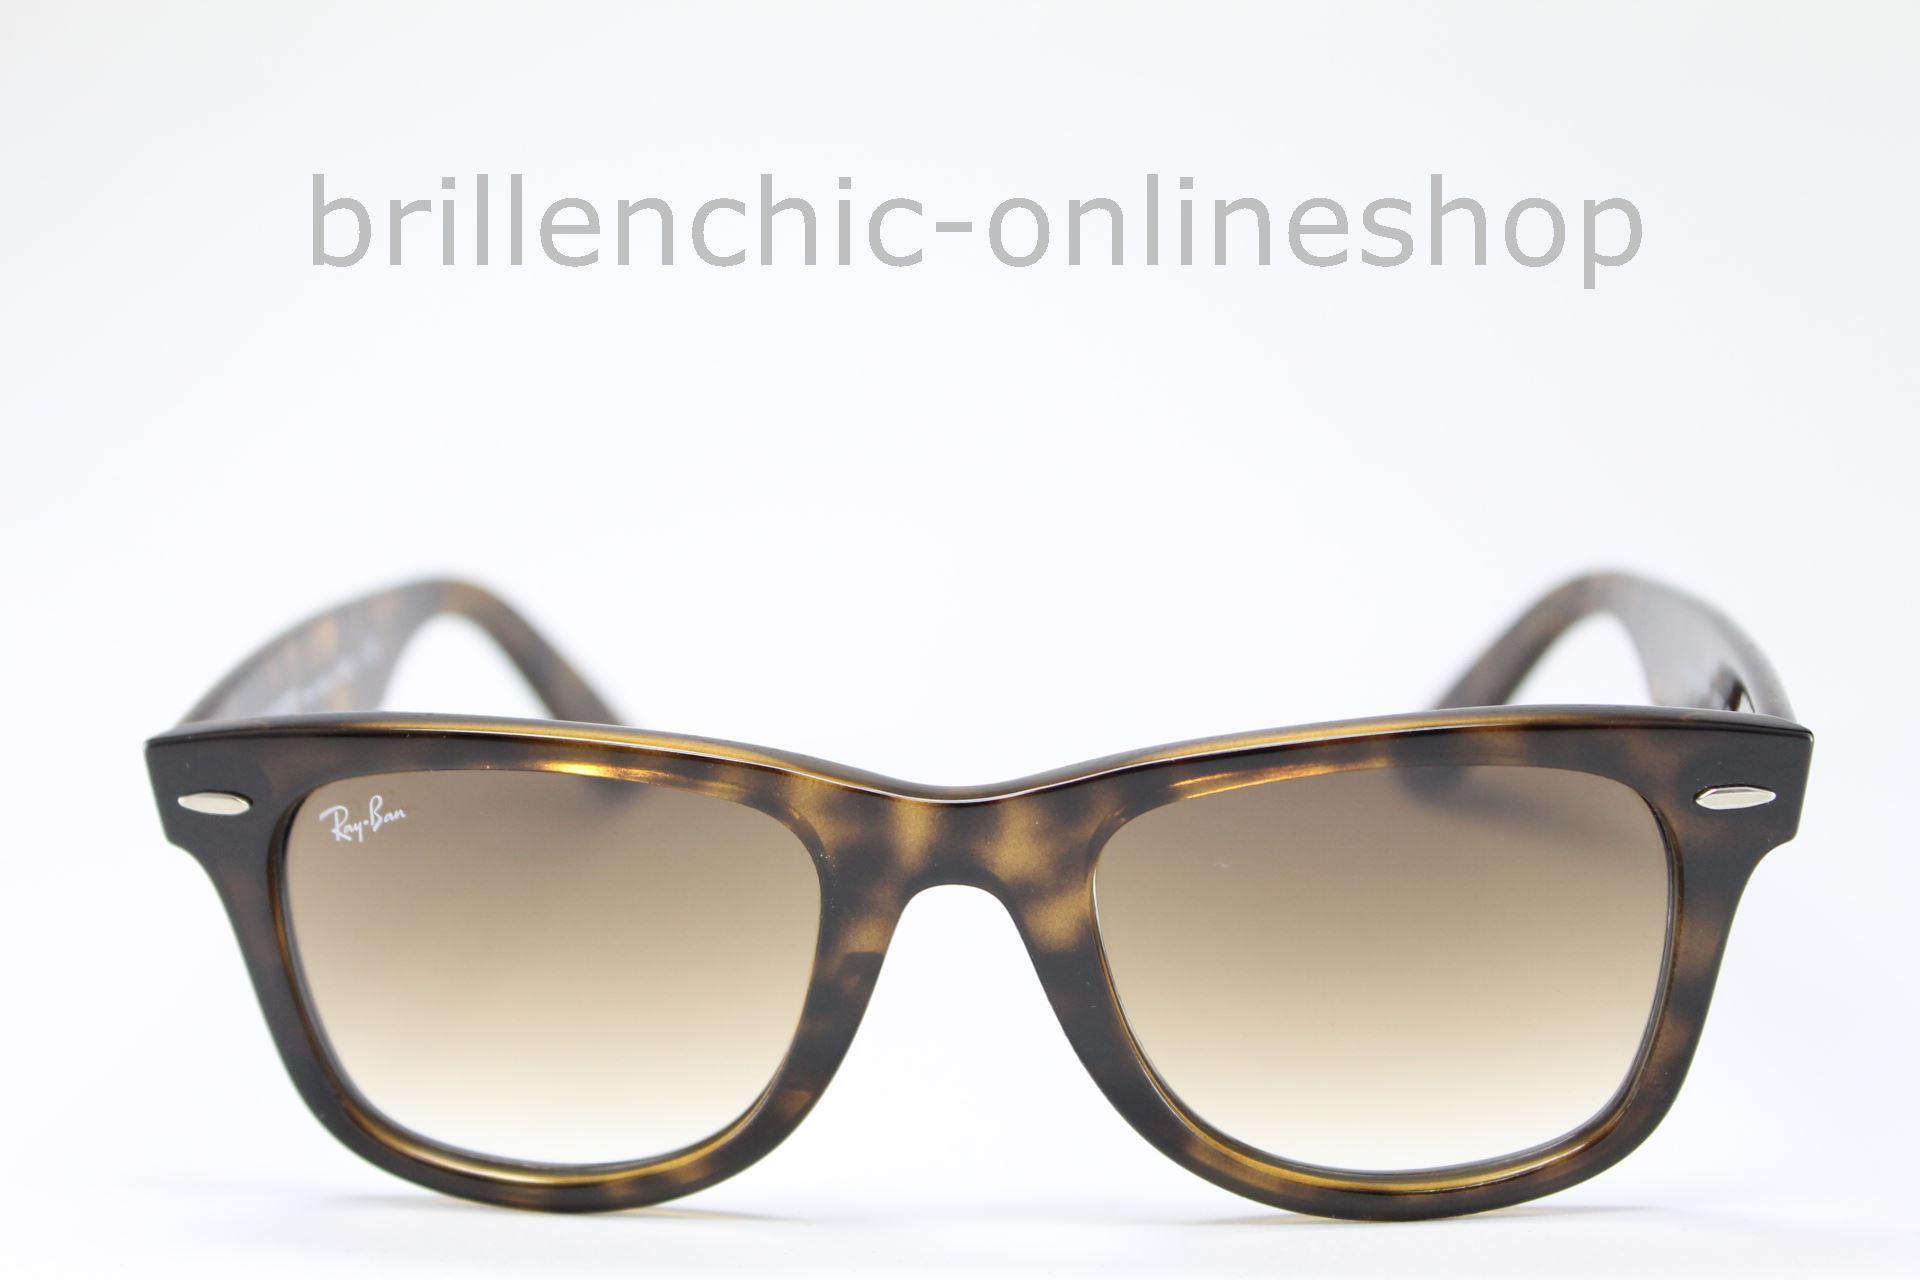 882926dbaa Brillenchic-onlineshop in Berlin - Ray Ban WAYFARER RB 4340 710 51